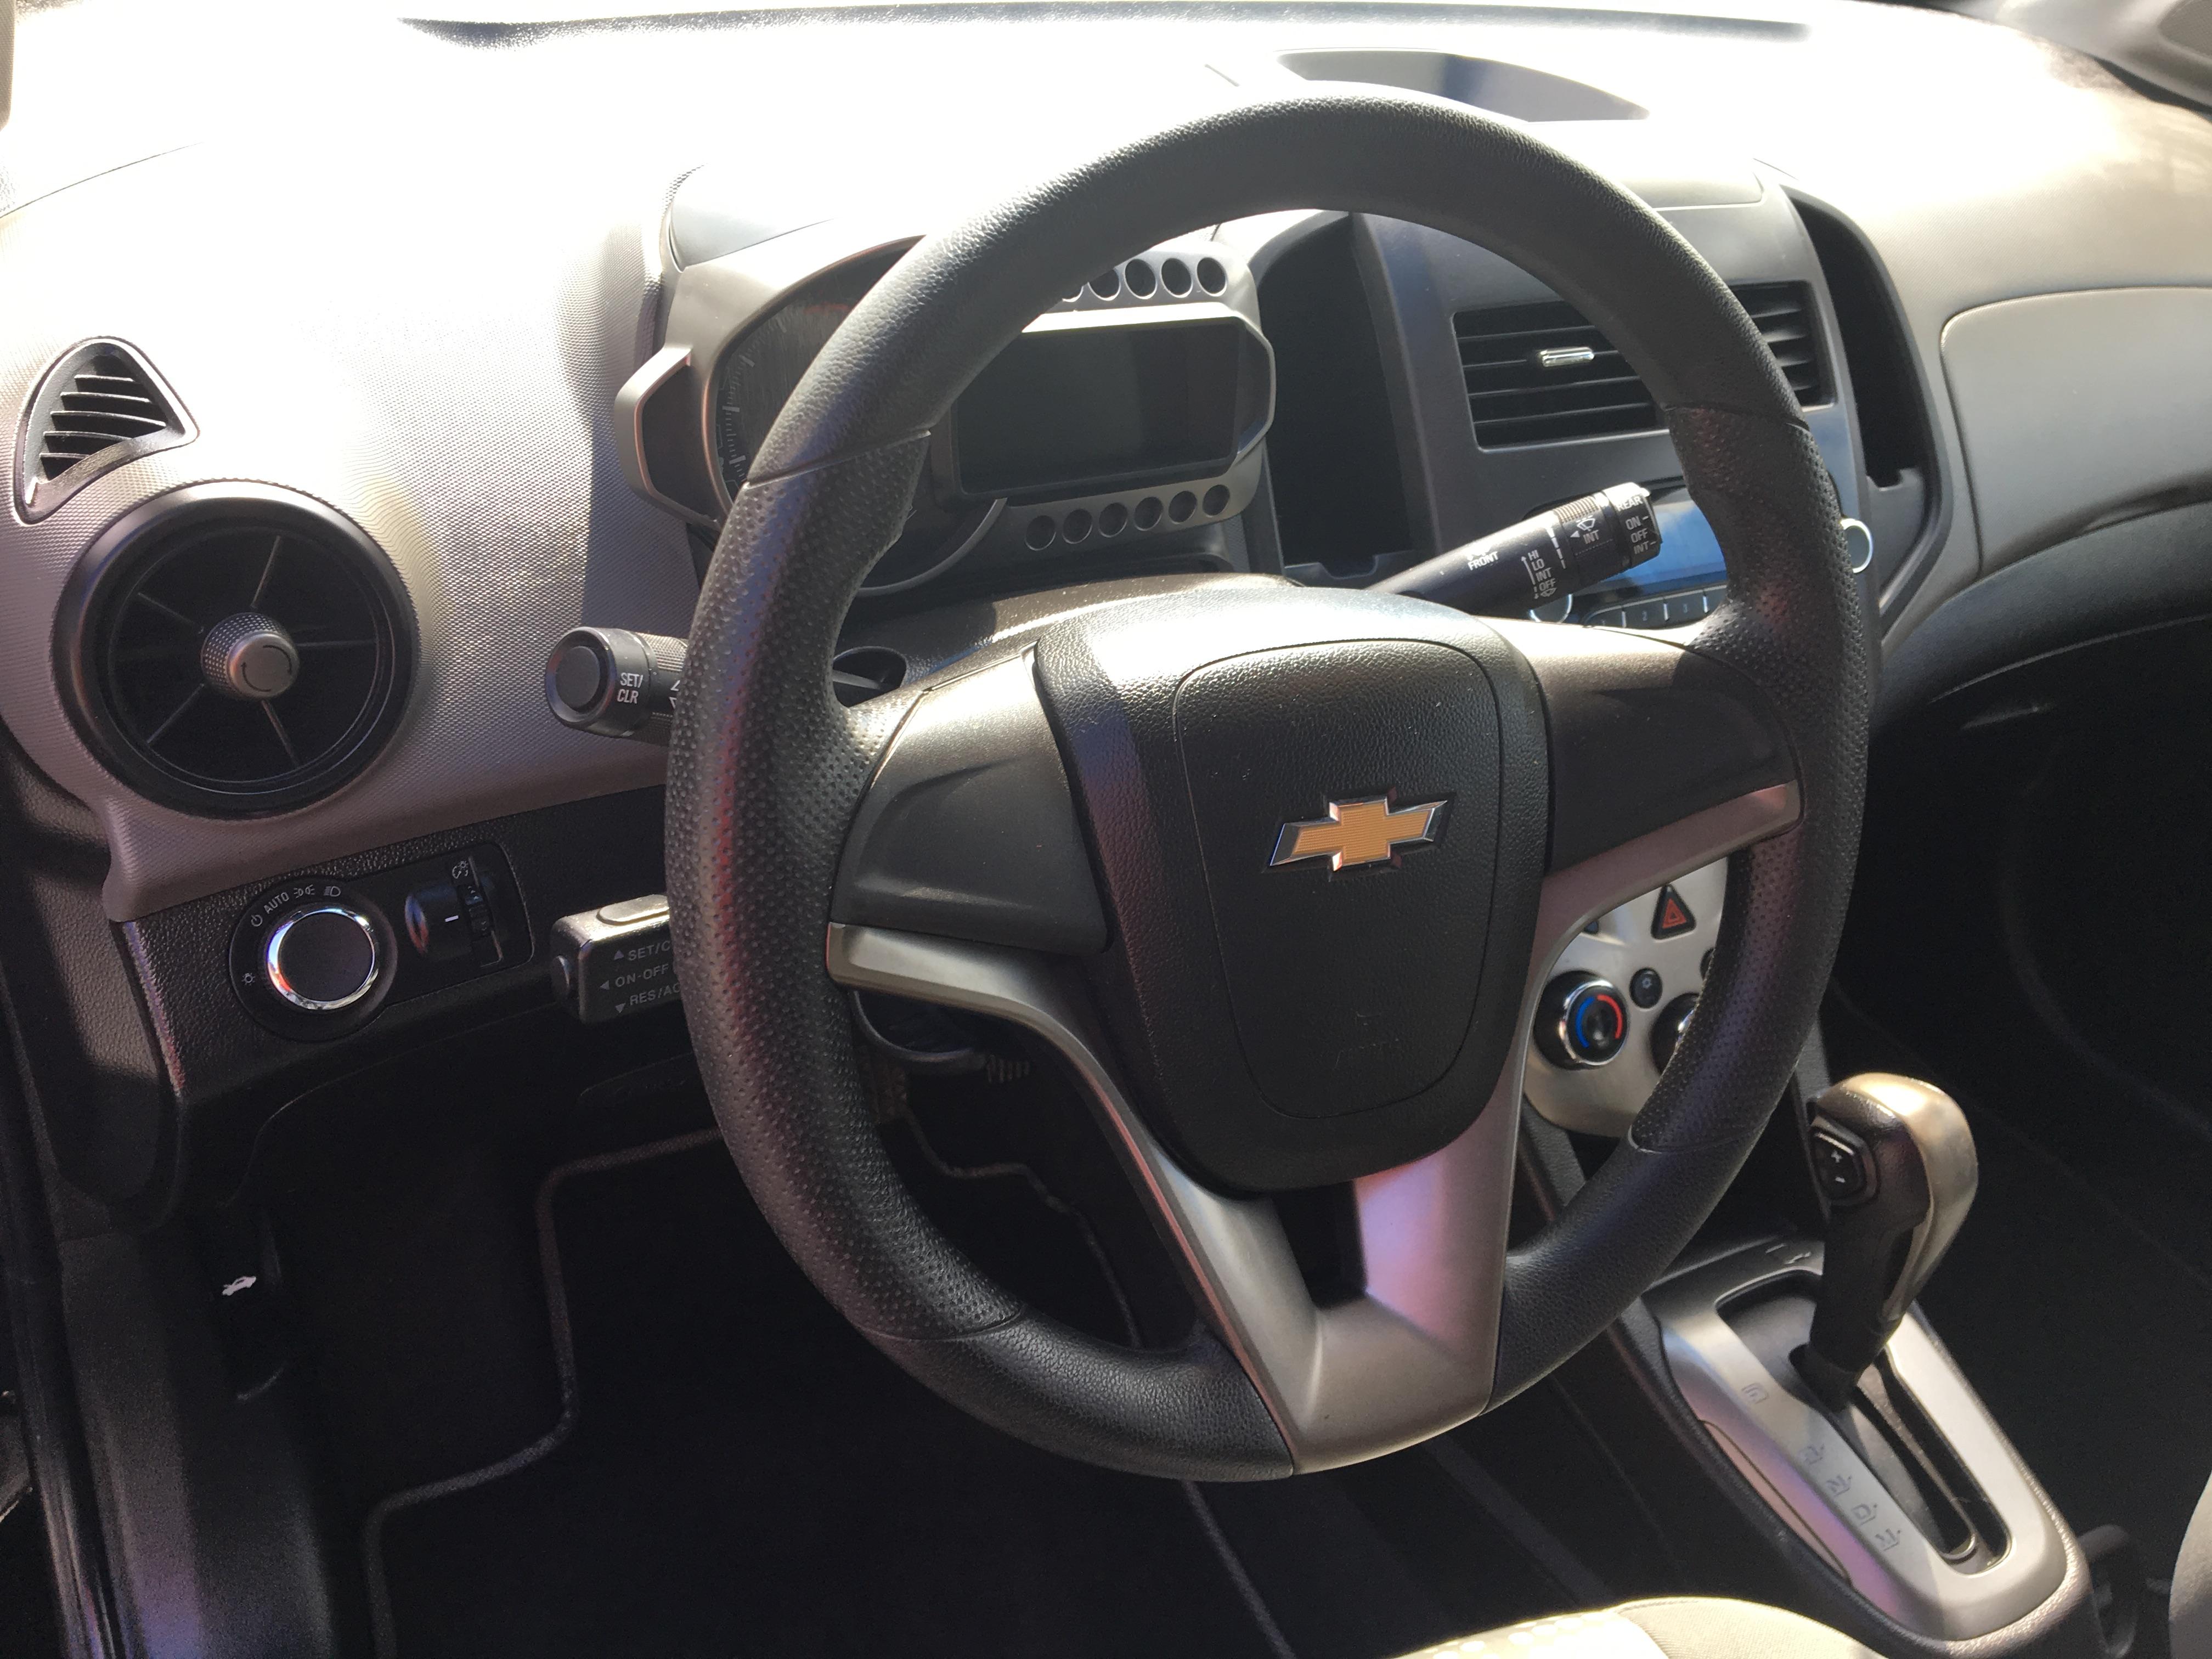 2012 Chevrolet Sonic LS 5 Dr HB